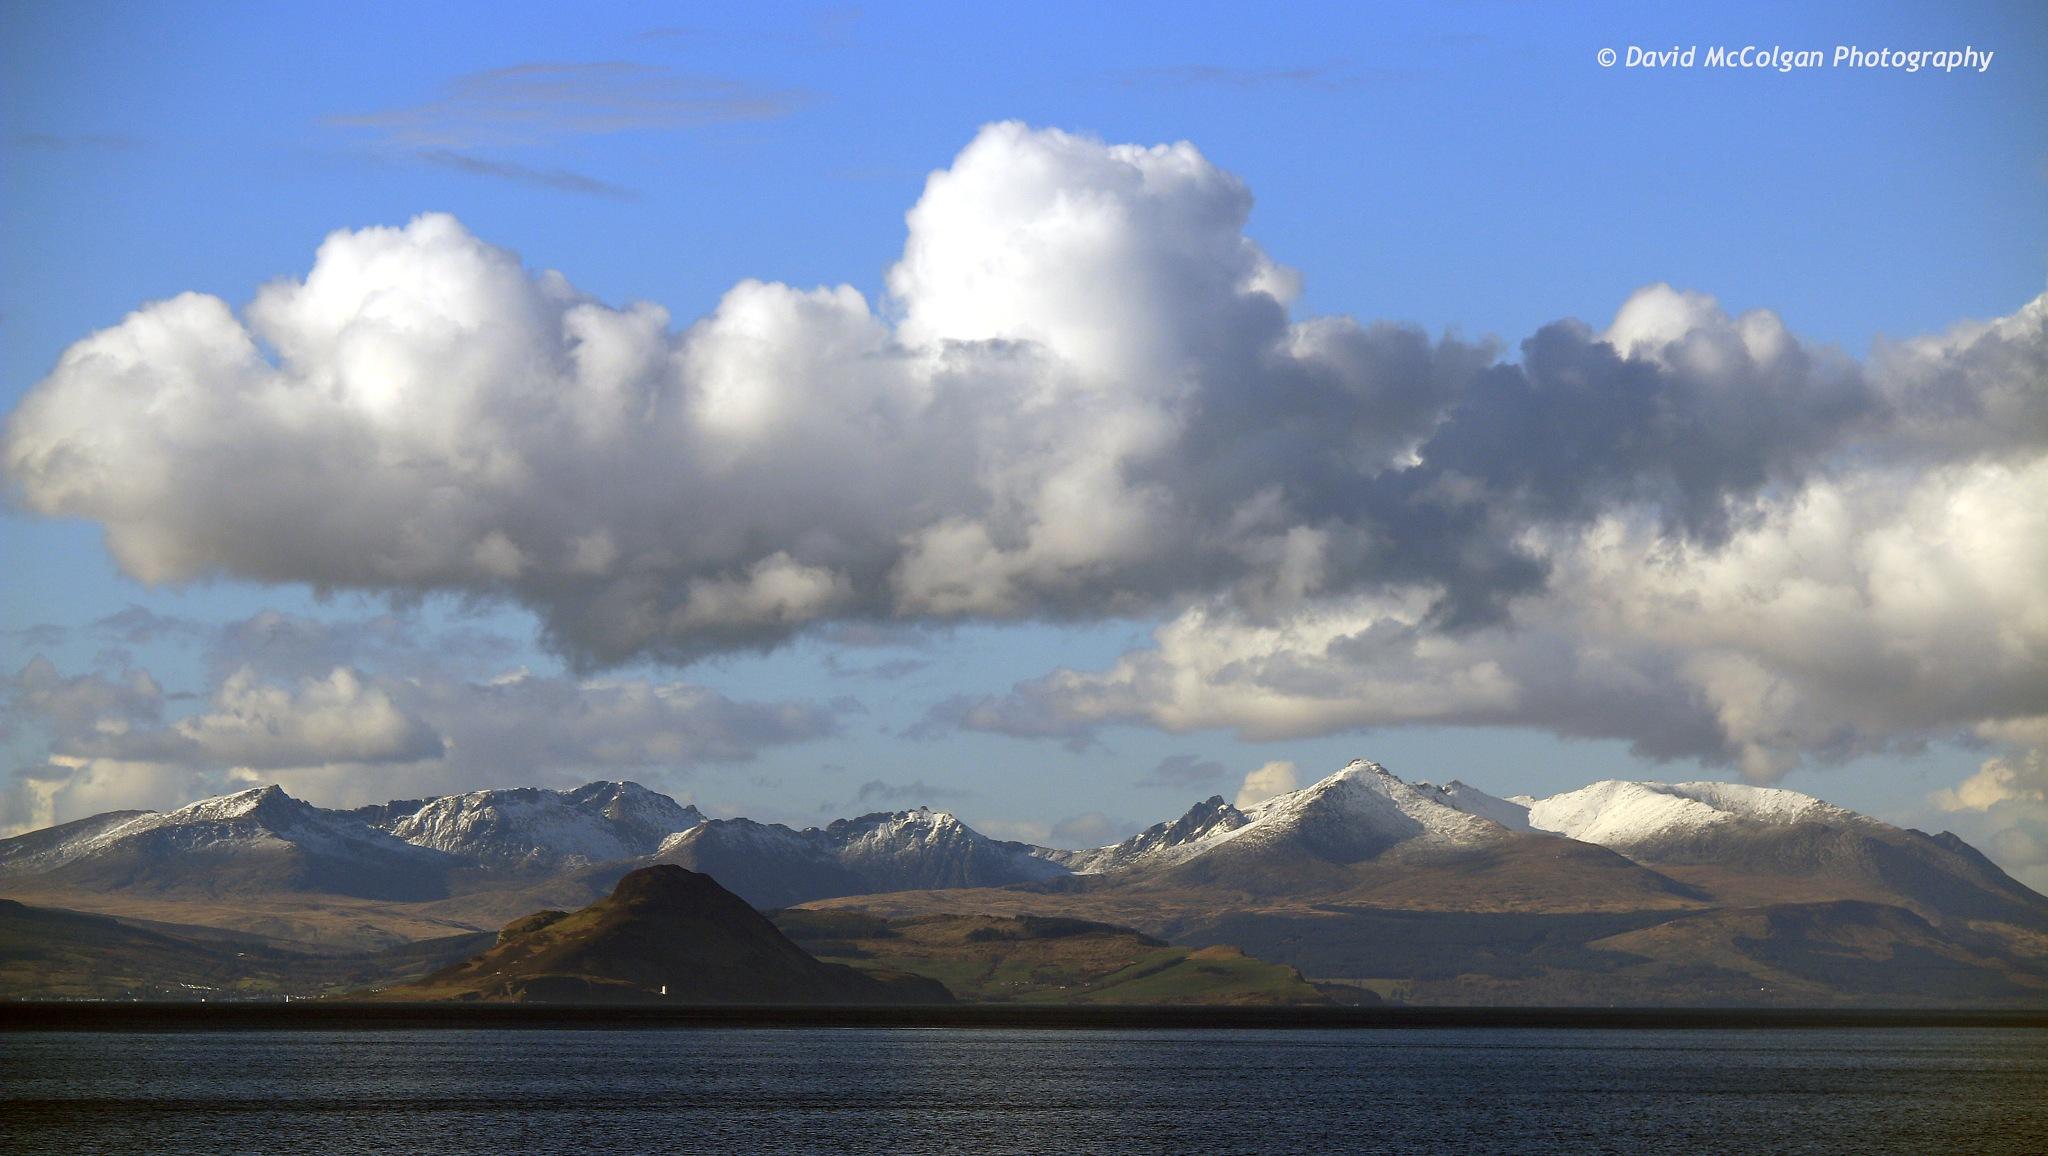 Isle of Arran, Scotland by David McColgan Photography